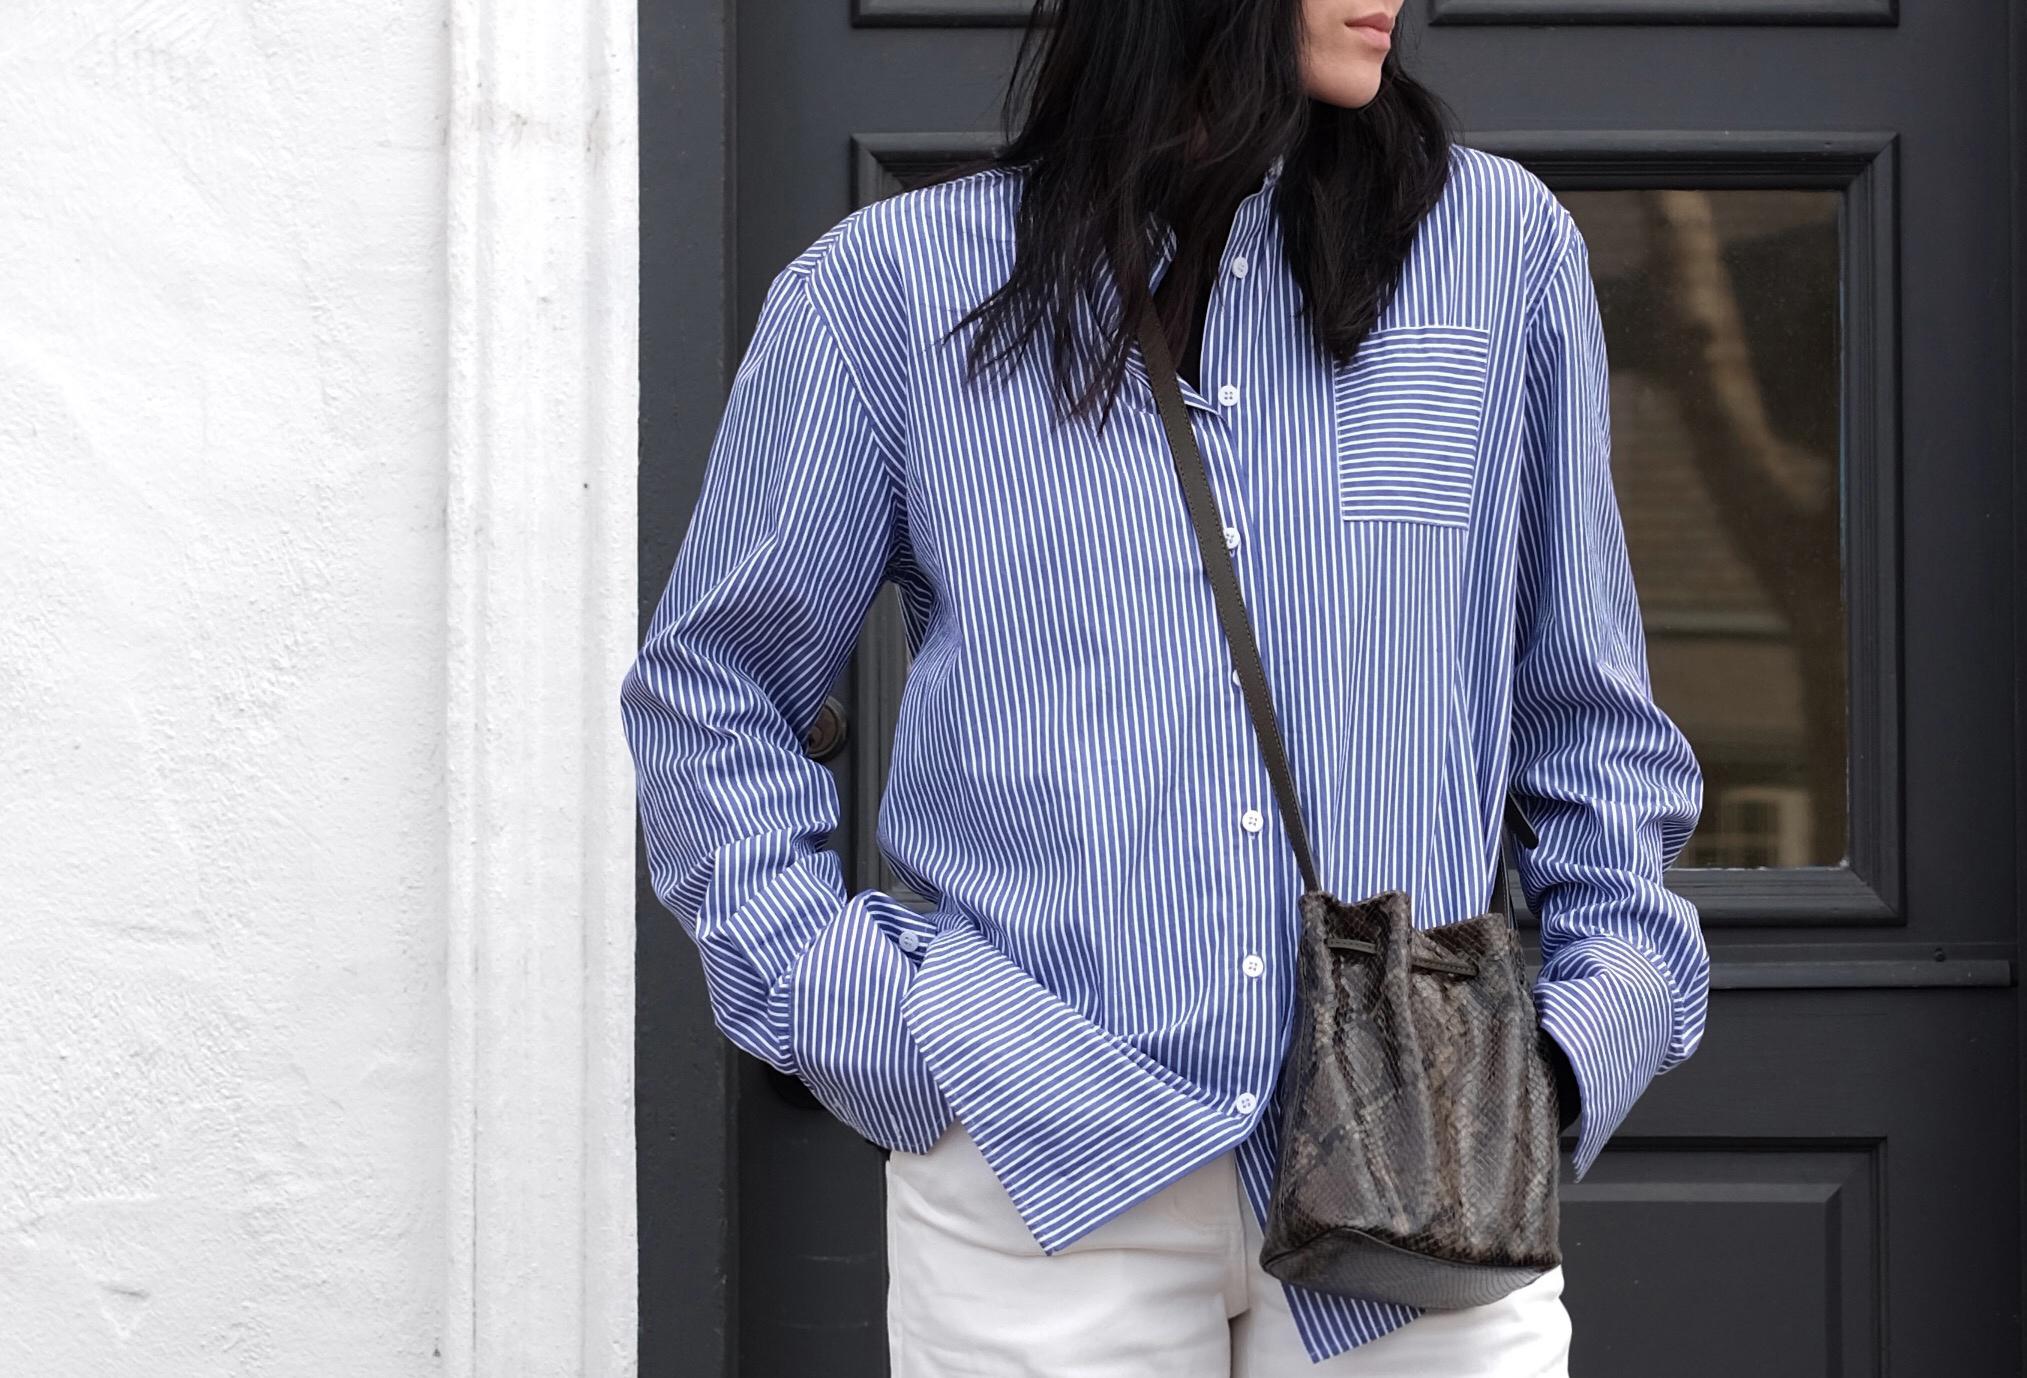 RIKA   Shirt   / ATP ATELIER   Bag  / EVERLANE   Pants